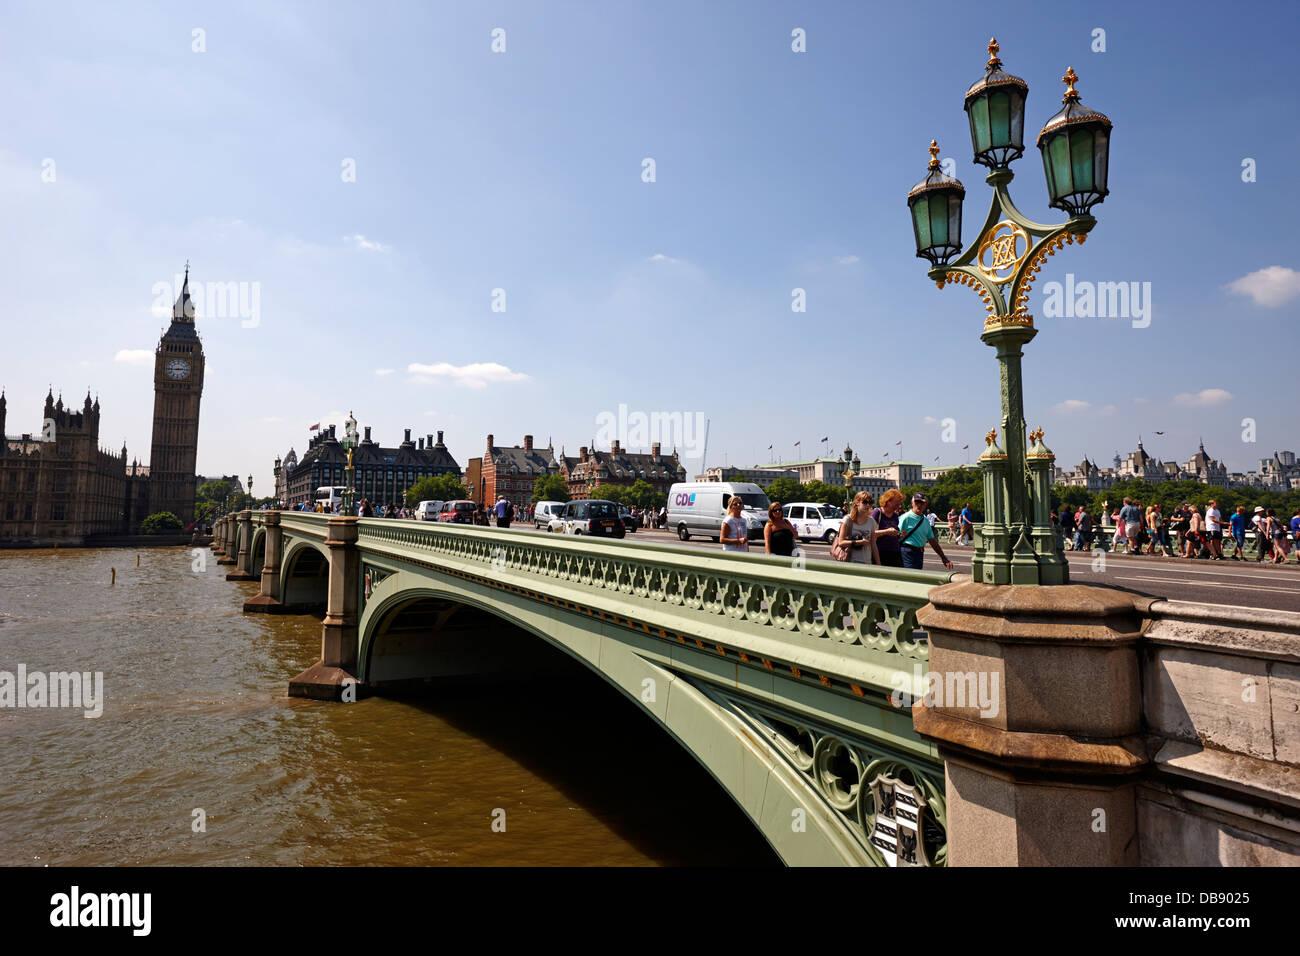 lampost on westminster bridge central London England UK Stock Photo